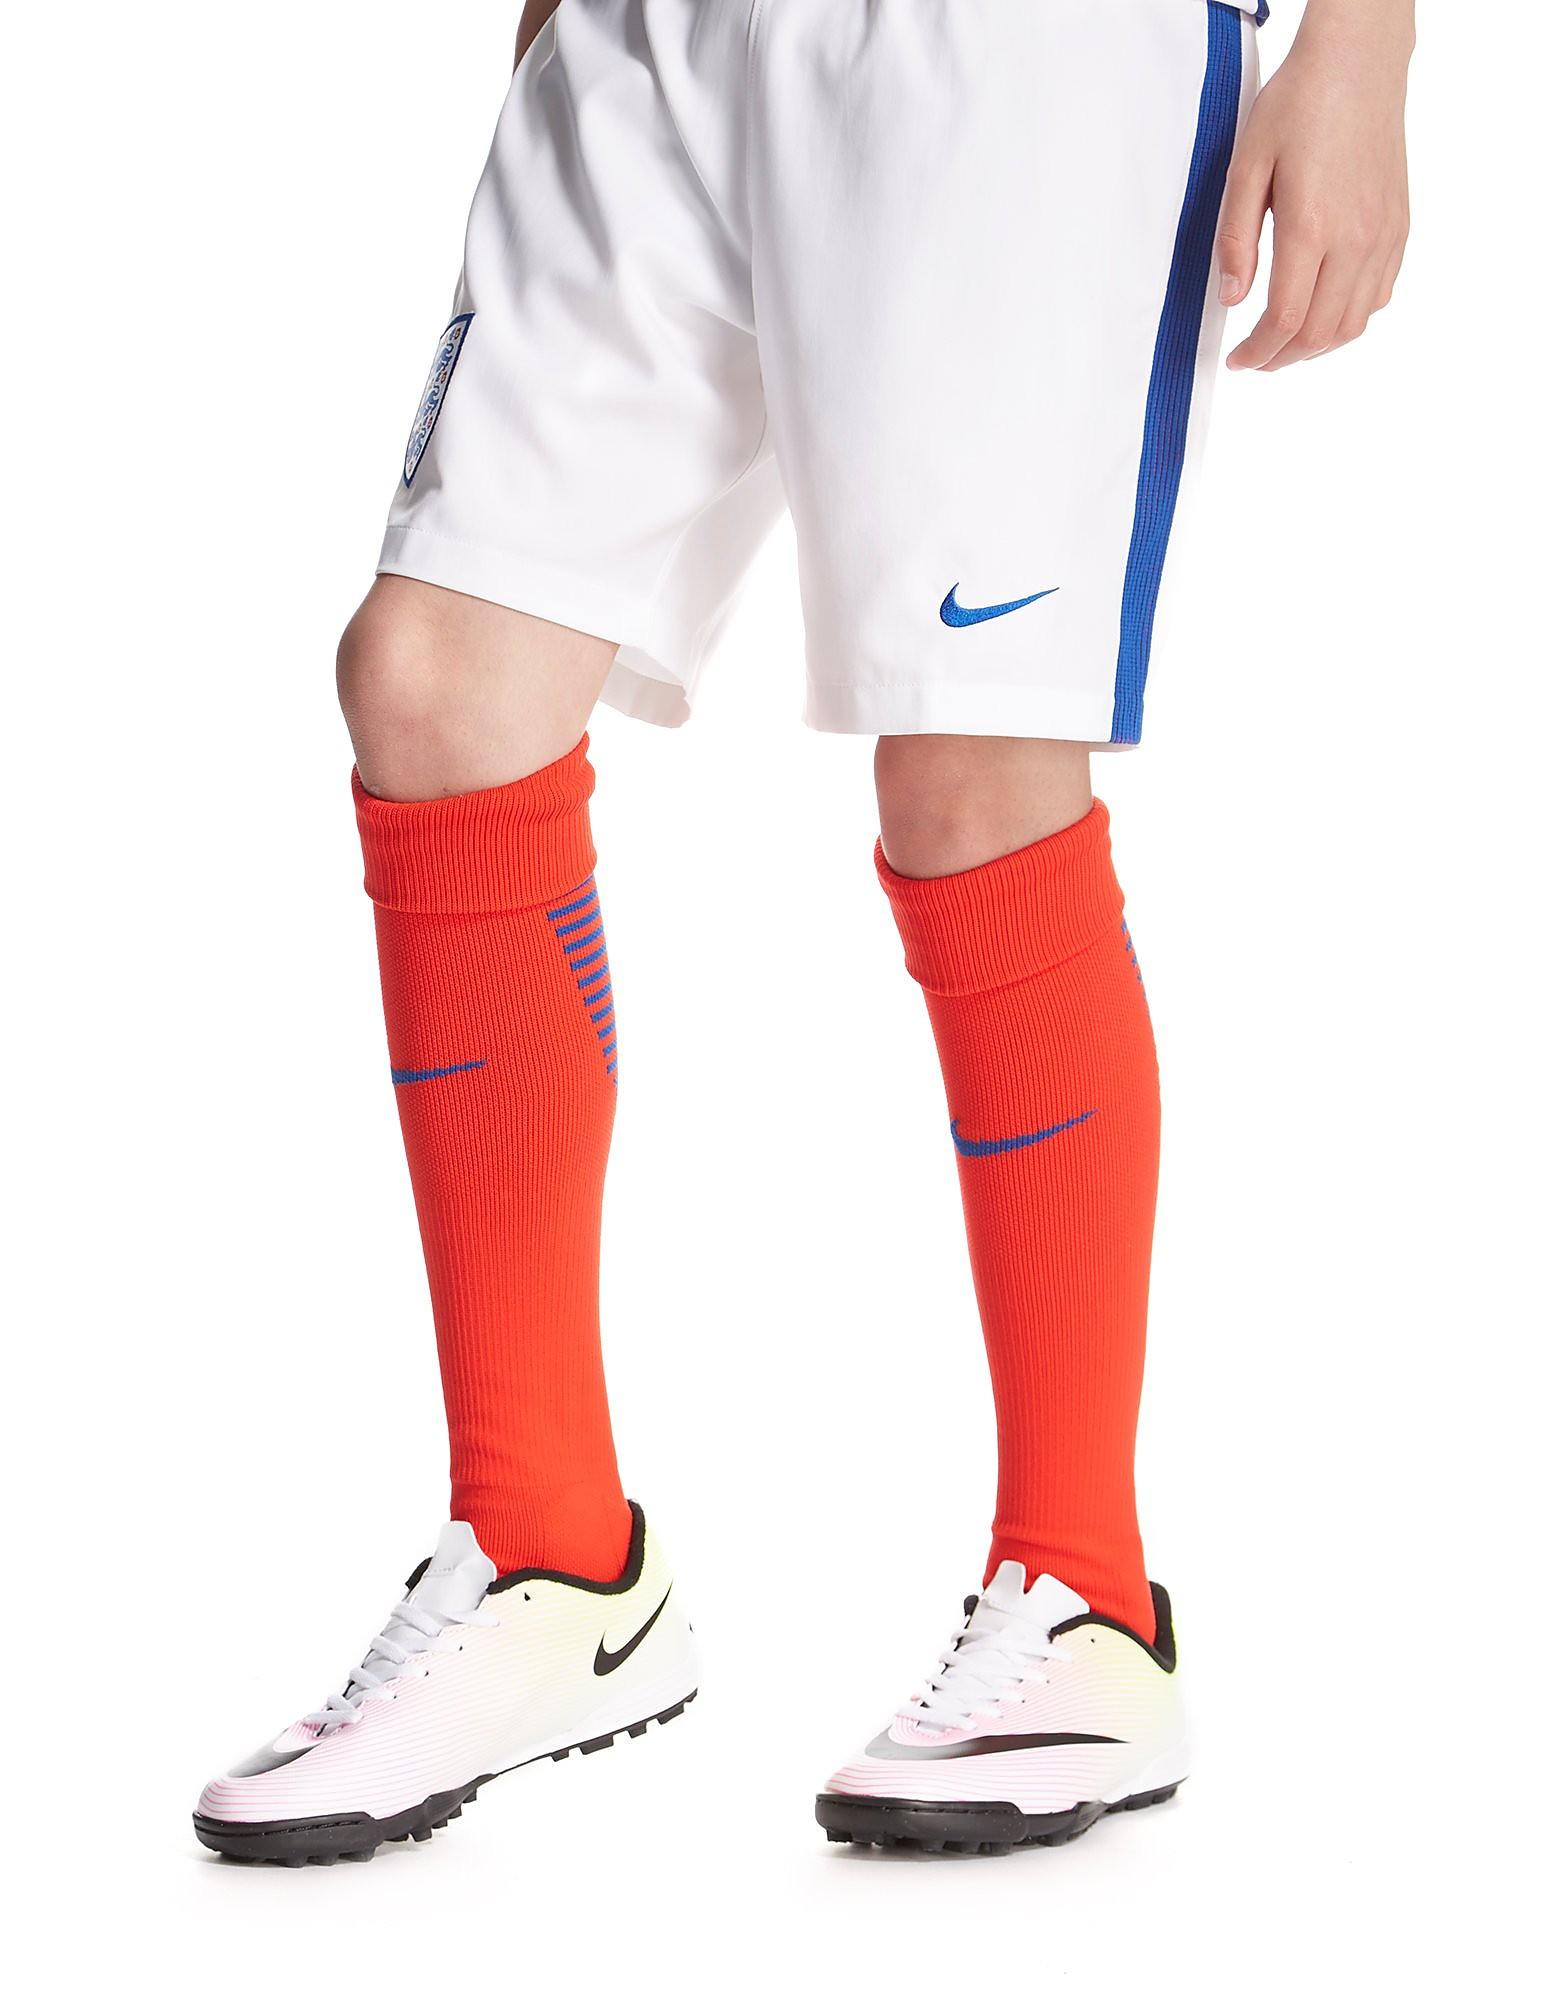 Nike Calzini della prima divisa Inghilterra 2016 junior